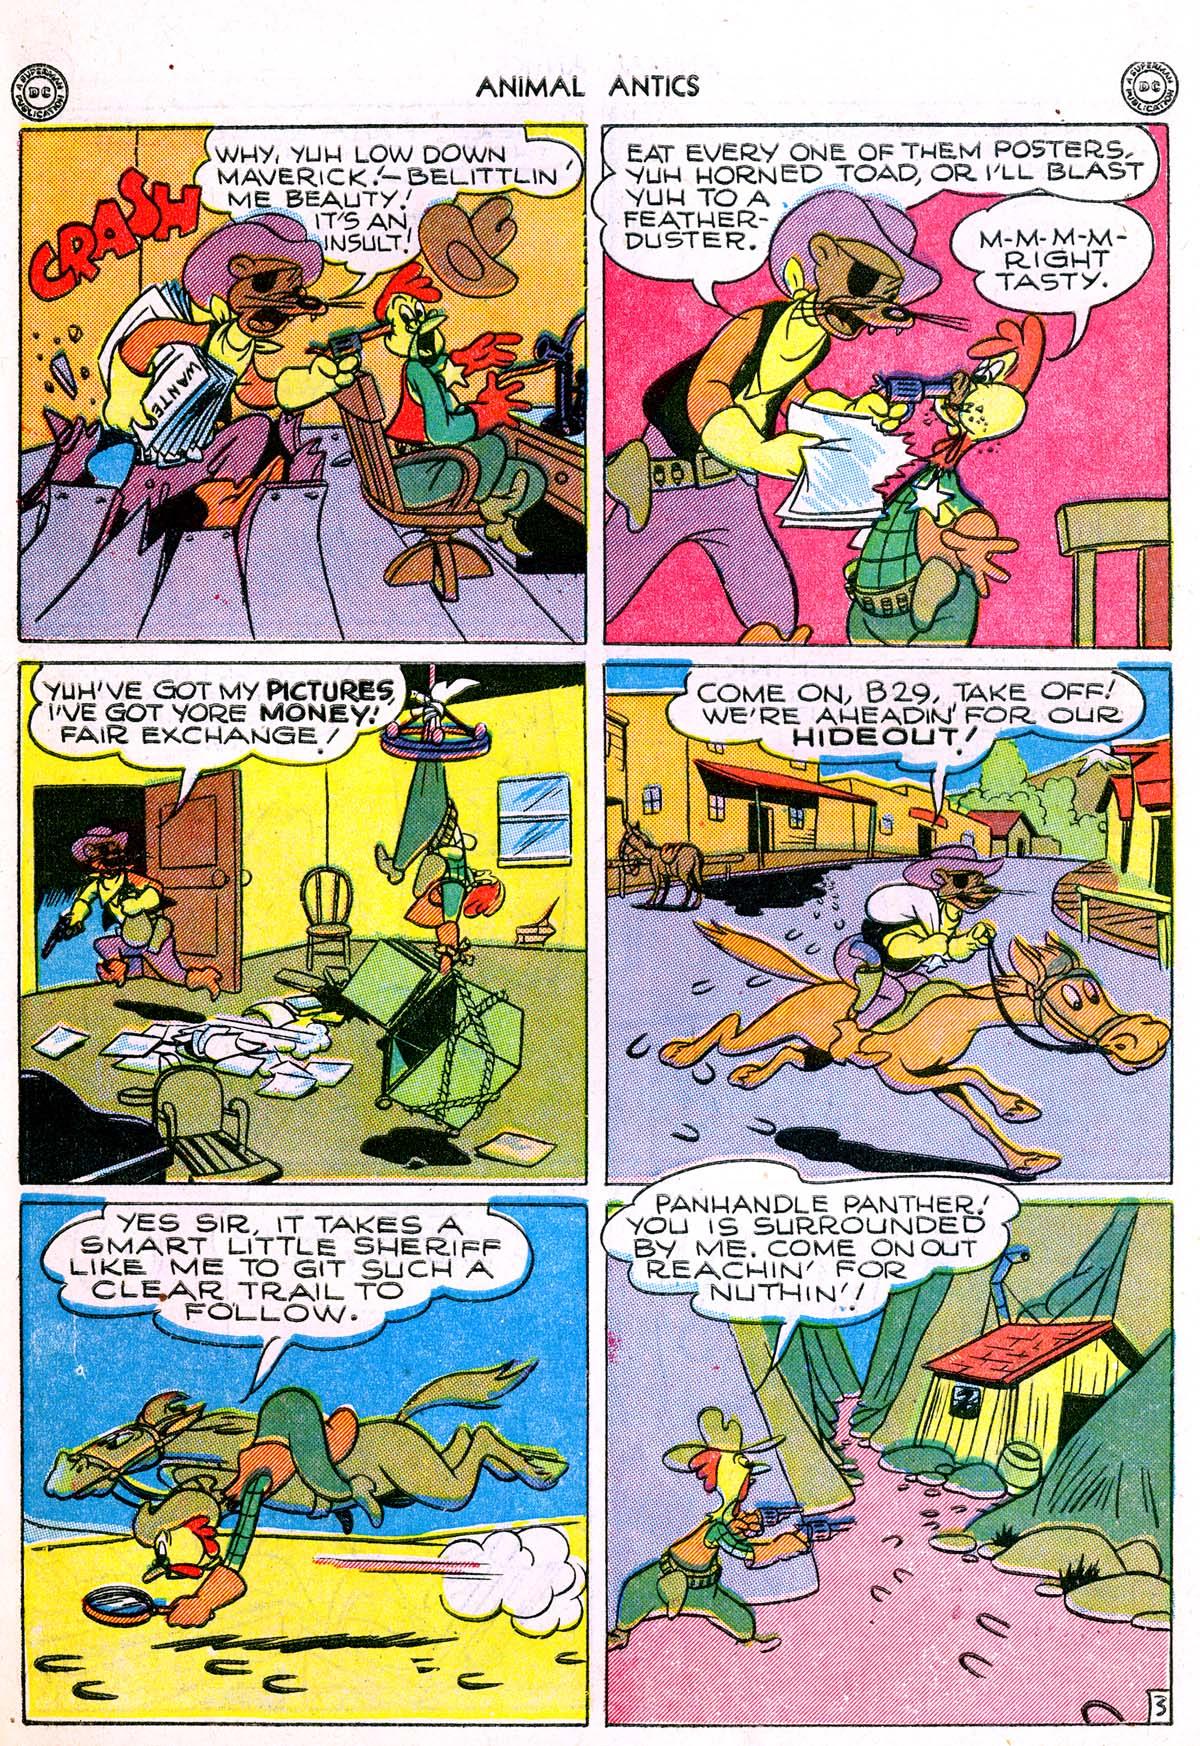 Read online Animal Antics comic -  Issue #1 - 14